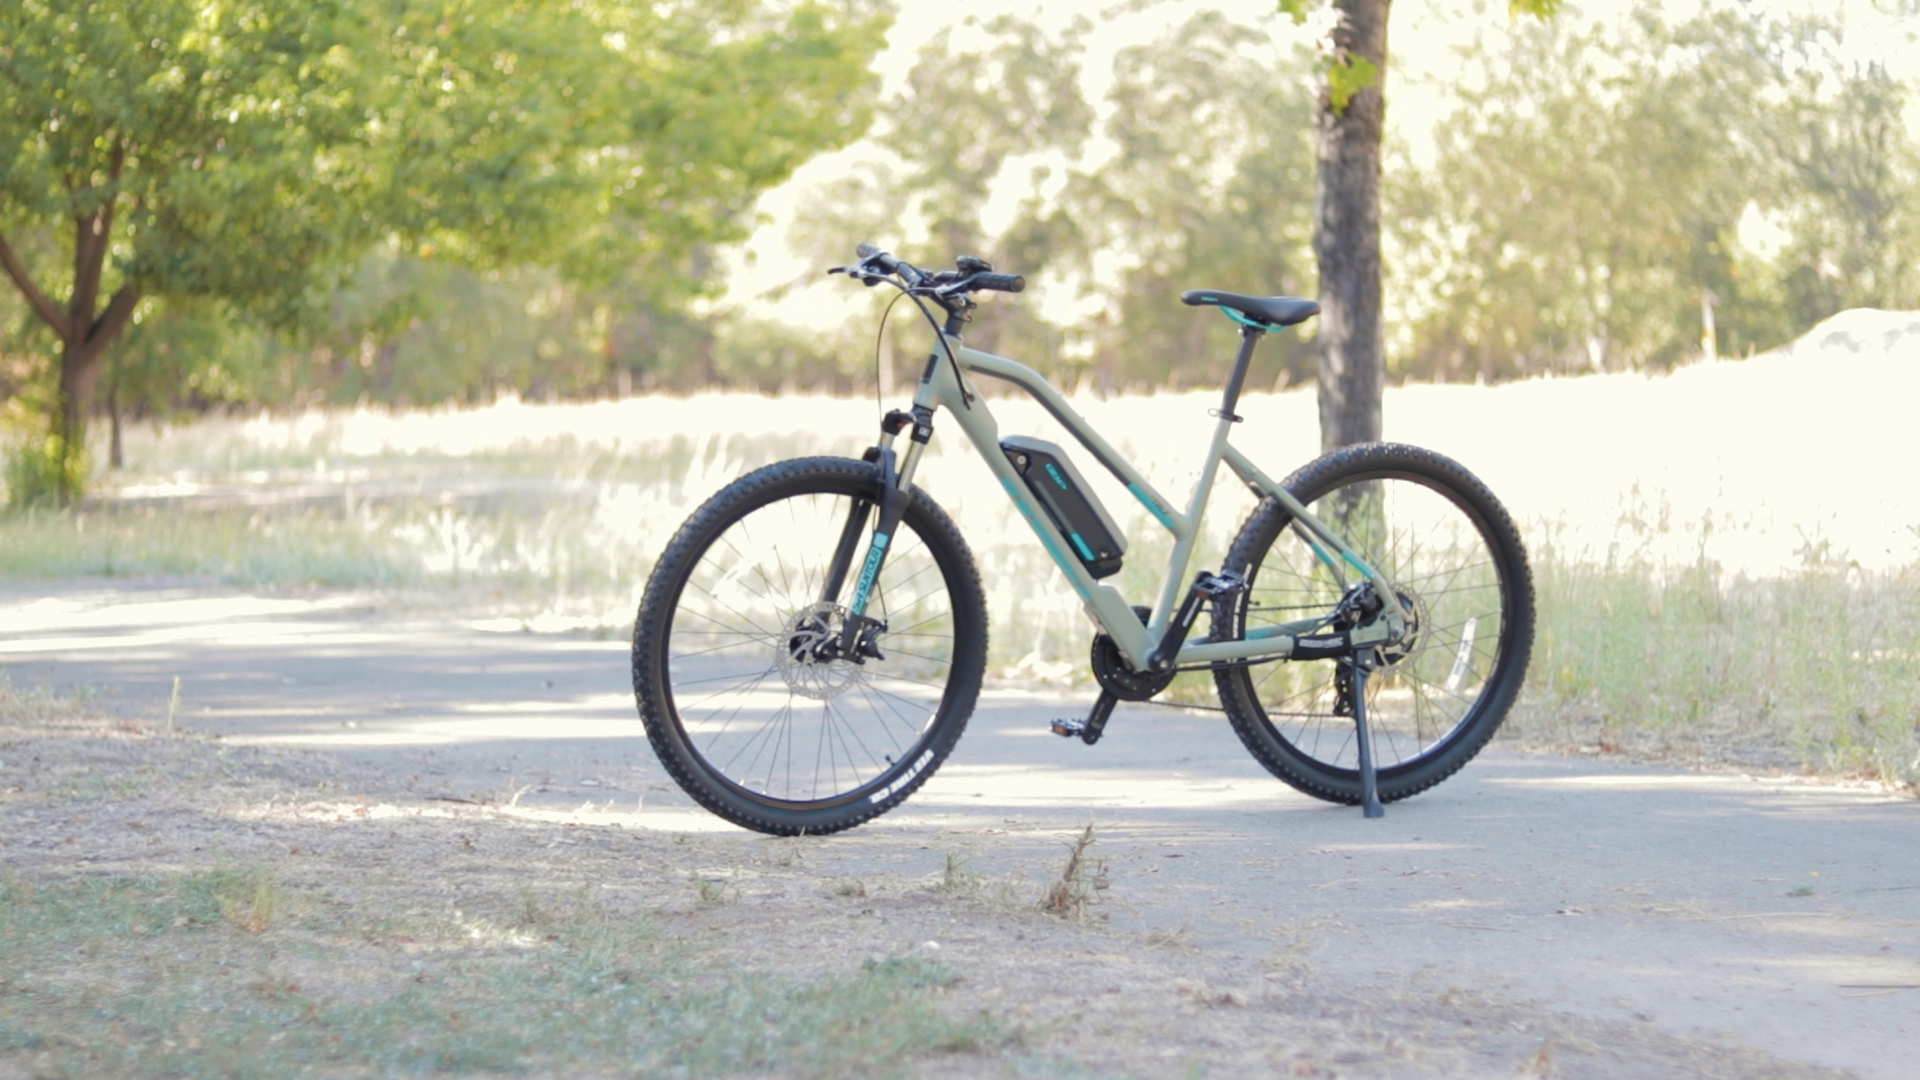 electrified-reviews-izip-trlz-electric-bike-review-profile-3.jpg